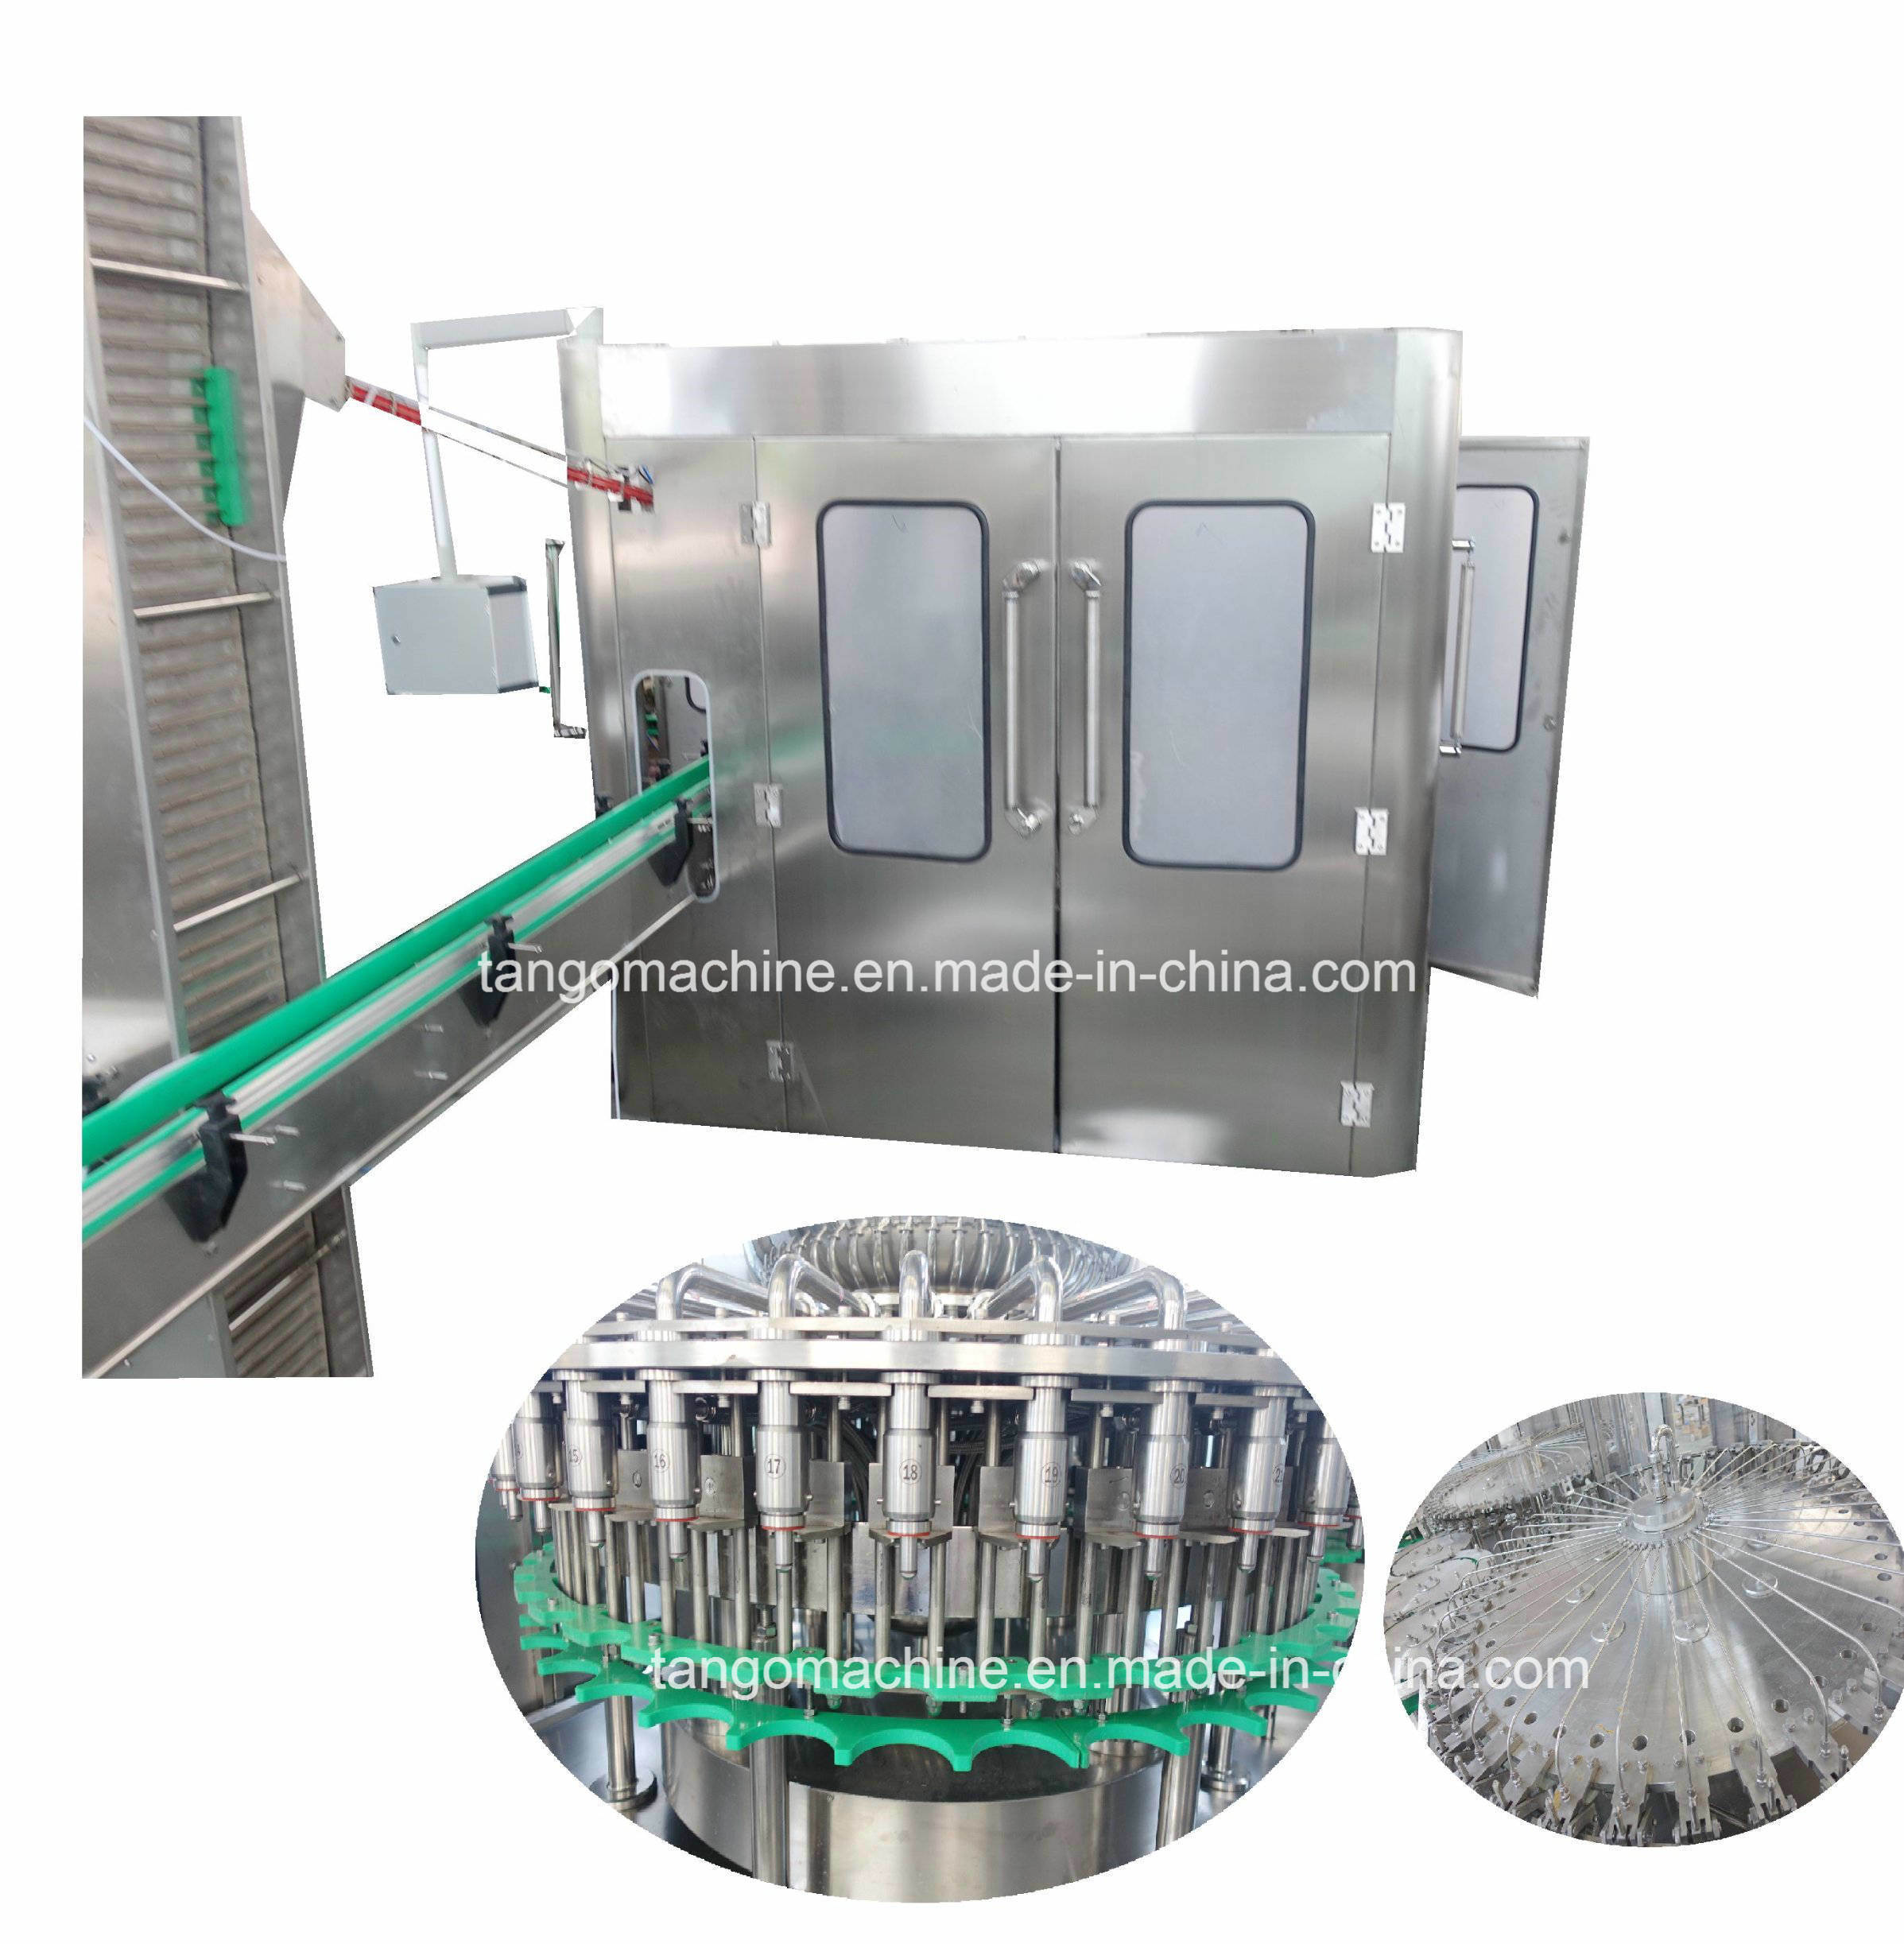 Complete Turn-Key Automatic Pet Bottle 6000bph 8000bph 12000bph Fruit Juice Plant Beverage Filling Line Machine Processing Packing Equipment